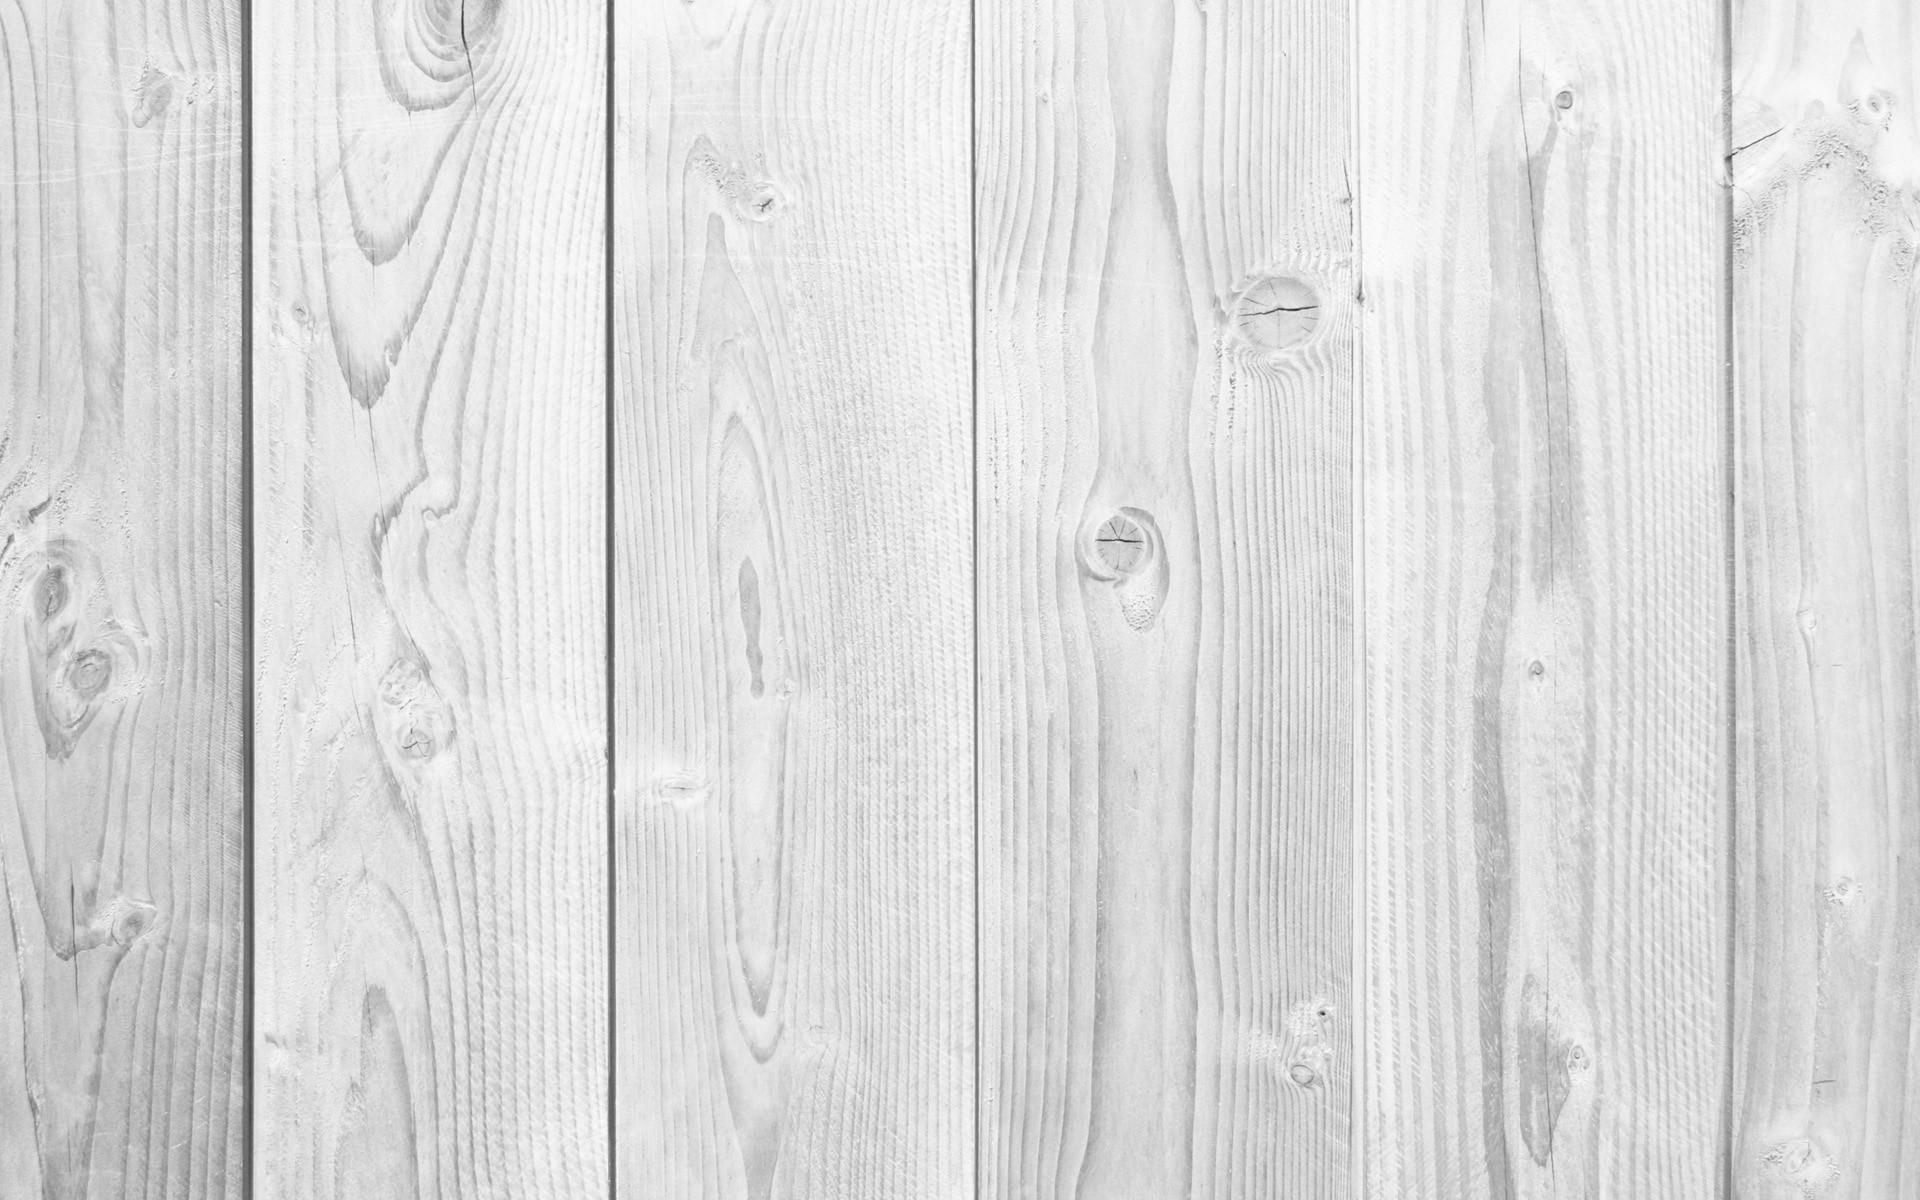 grey wooden board